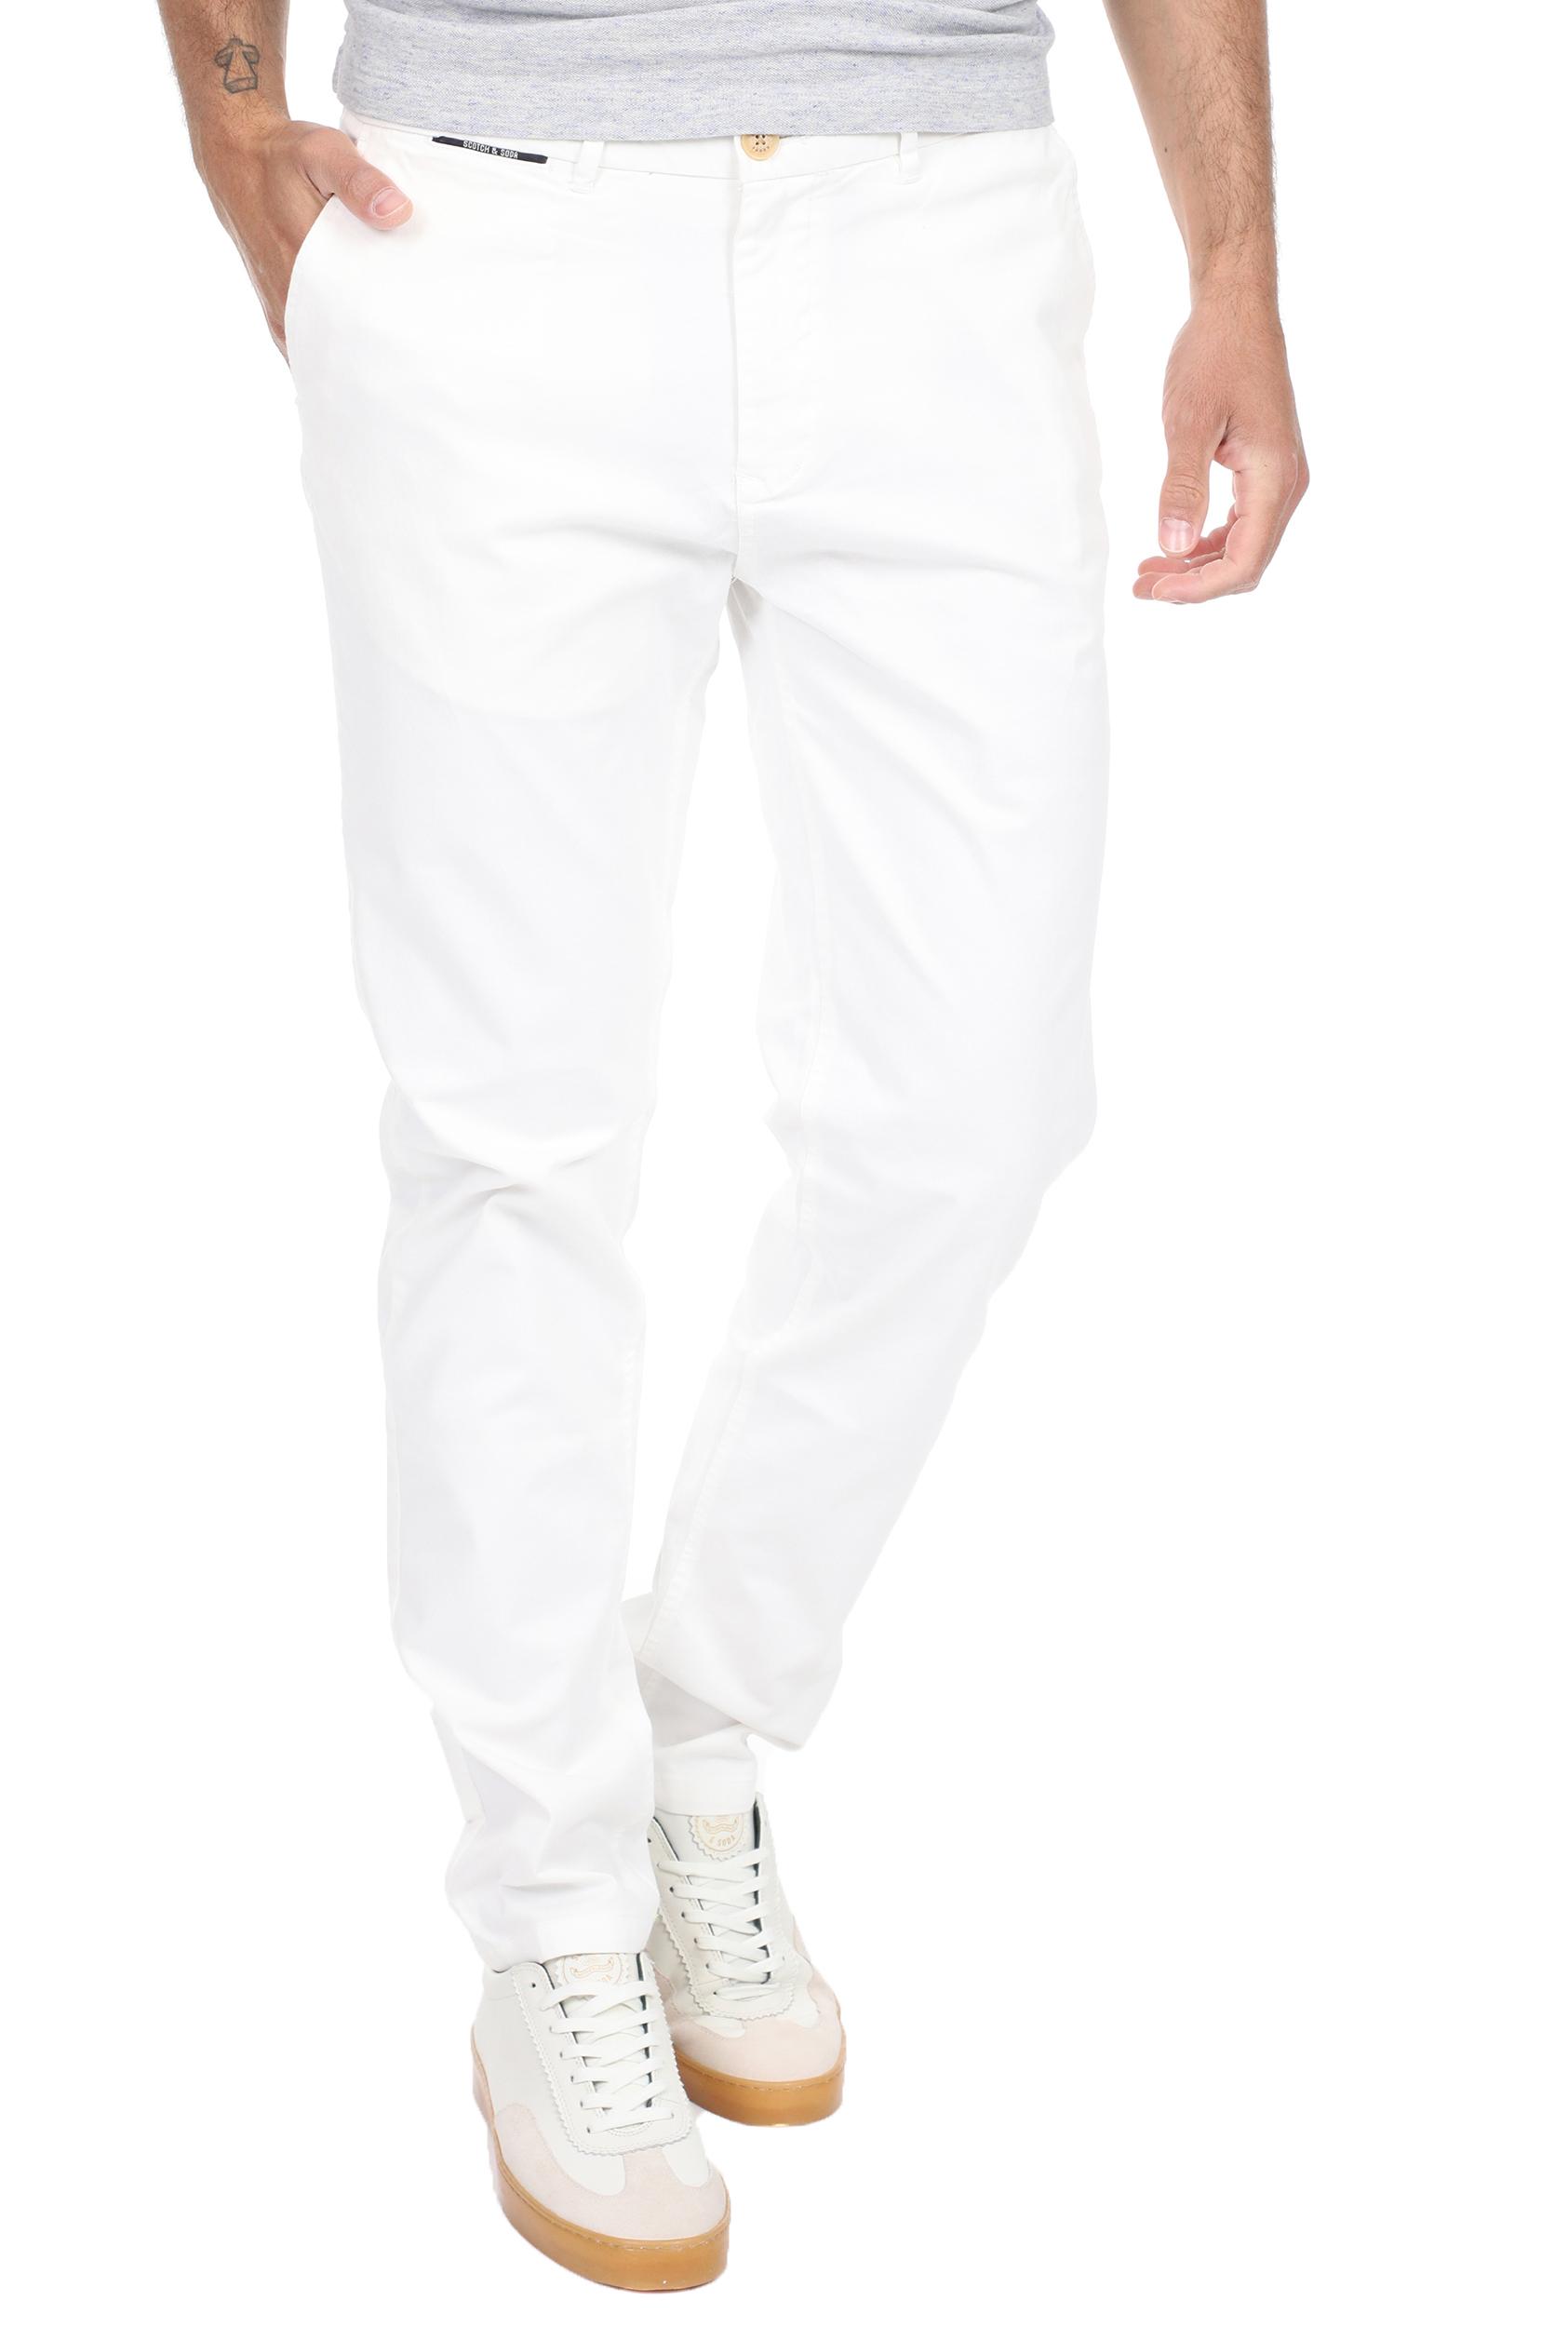 SCOTCH & SODA - Ανδρικό chino παντελόνι SCOTCH & SODA STUART λευκό